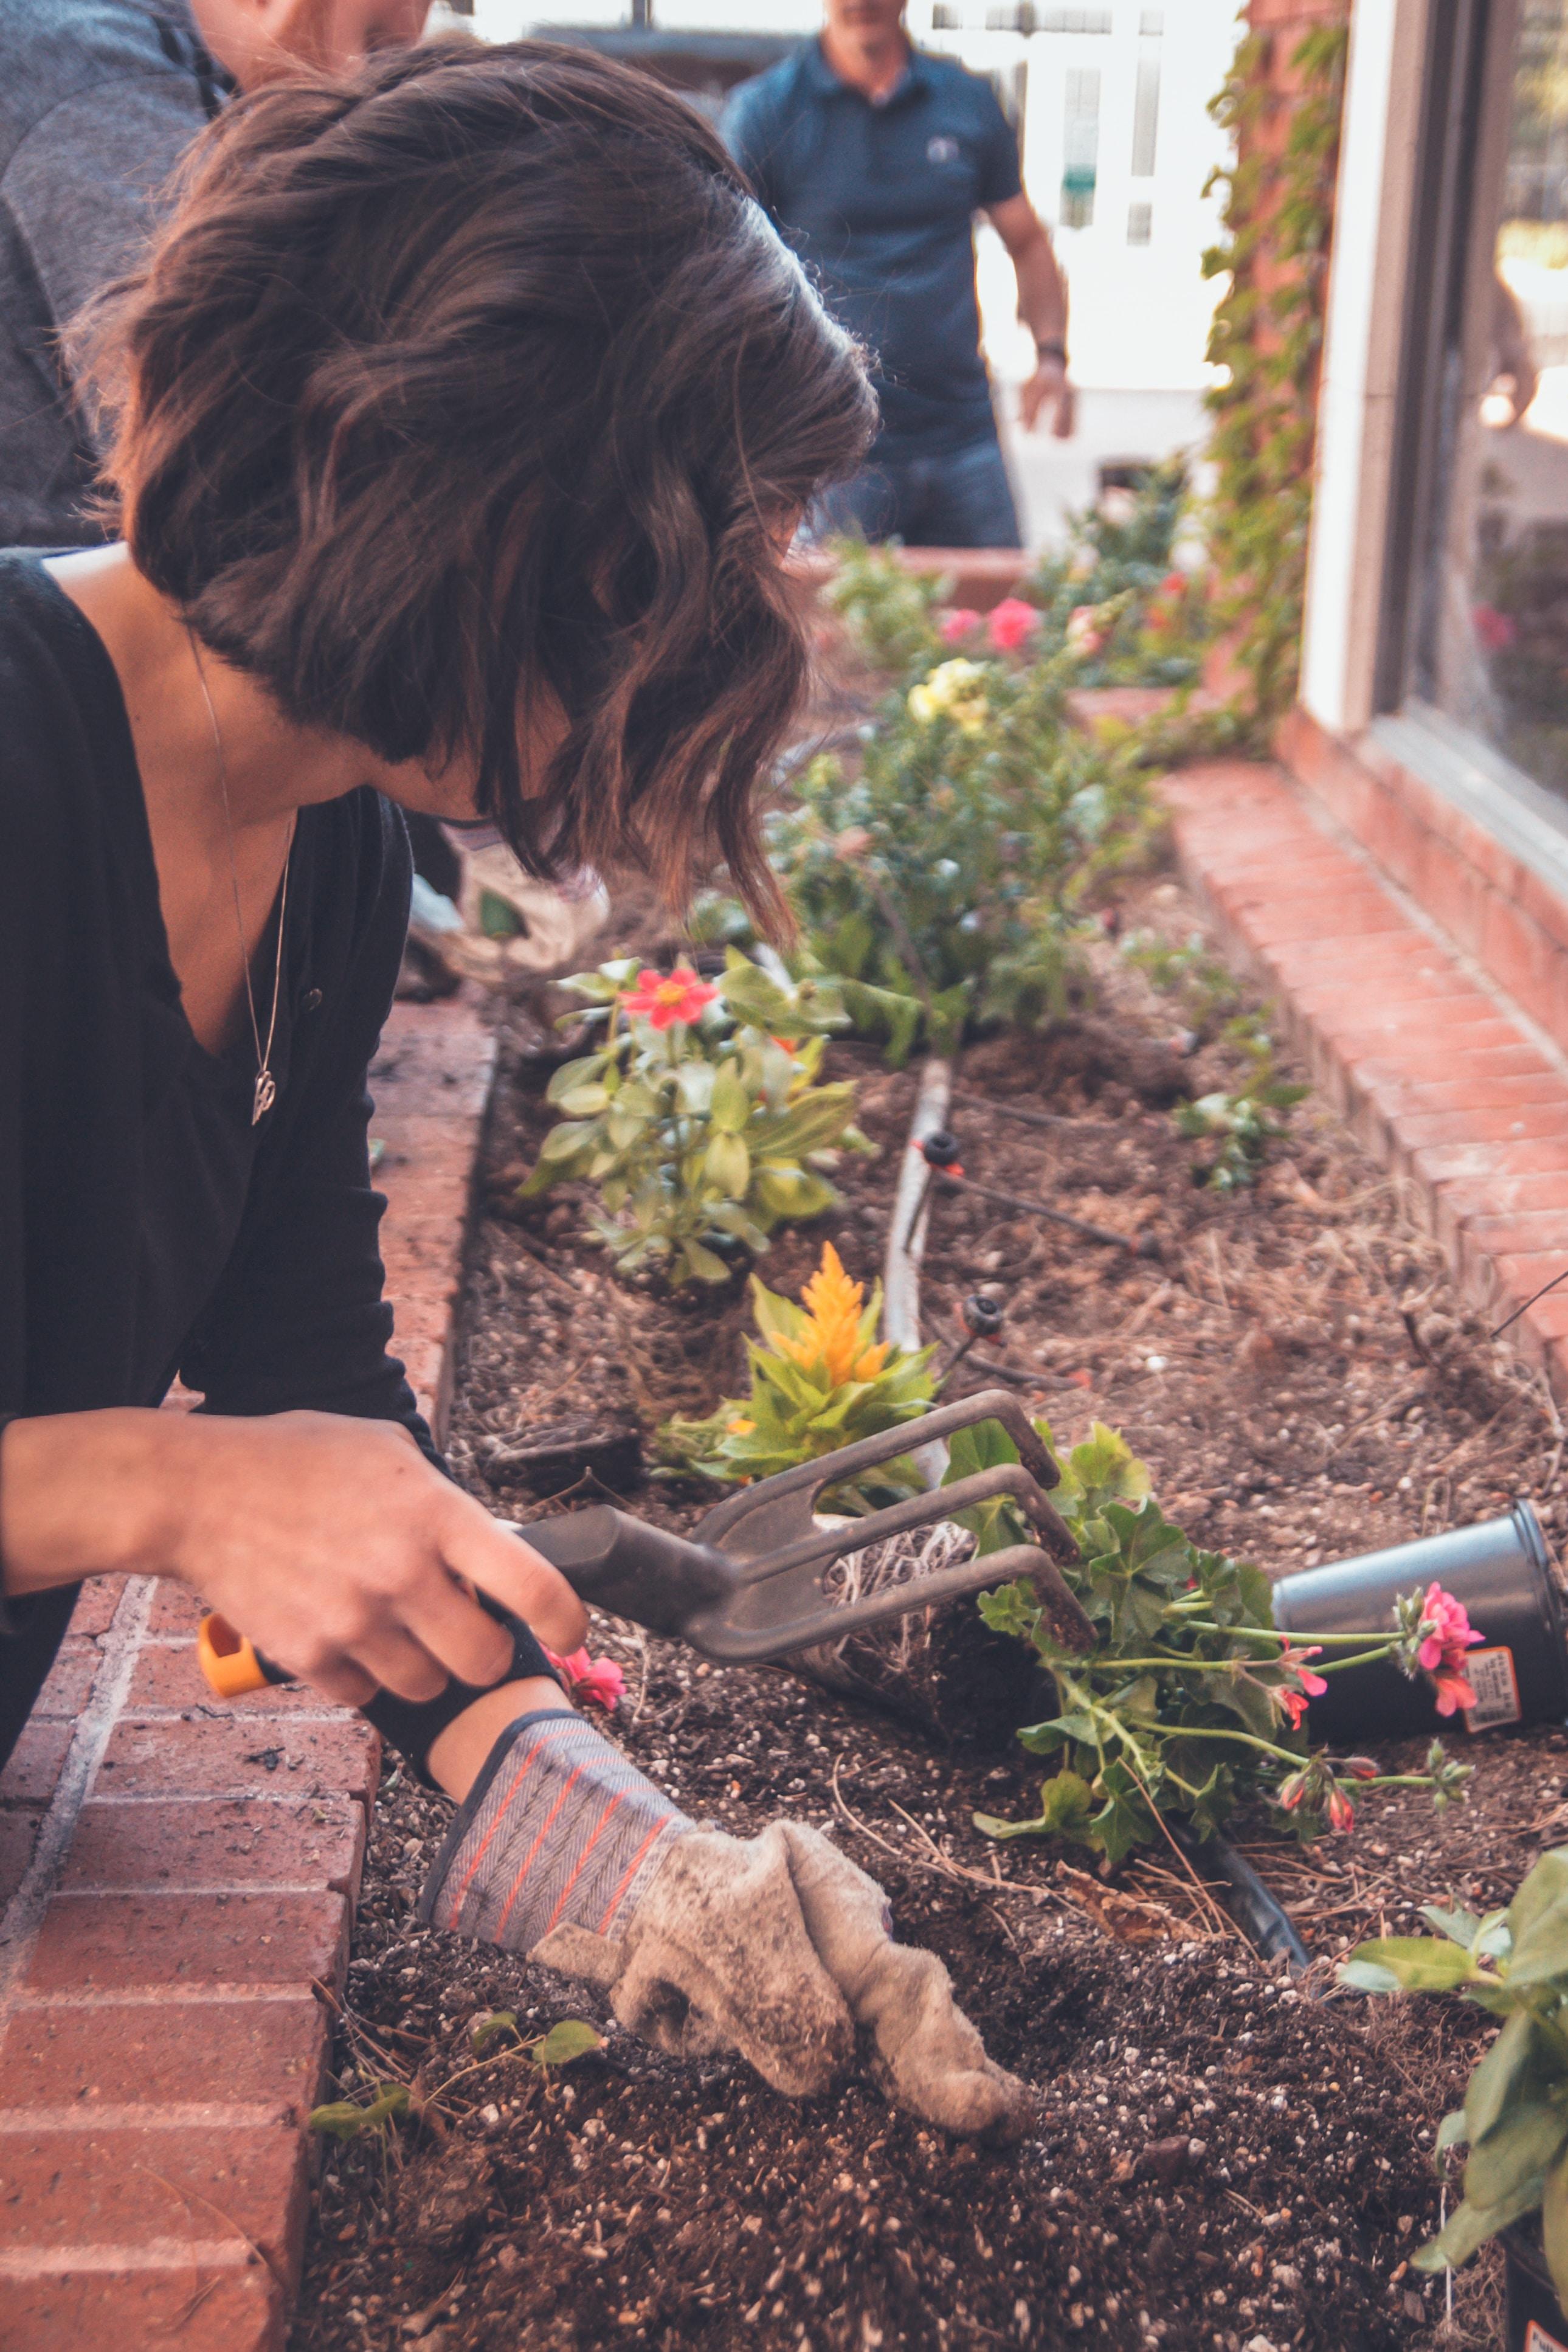 19 Creative Raised Bed Garden Ideas: Yard Decor For Every Season